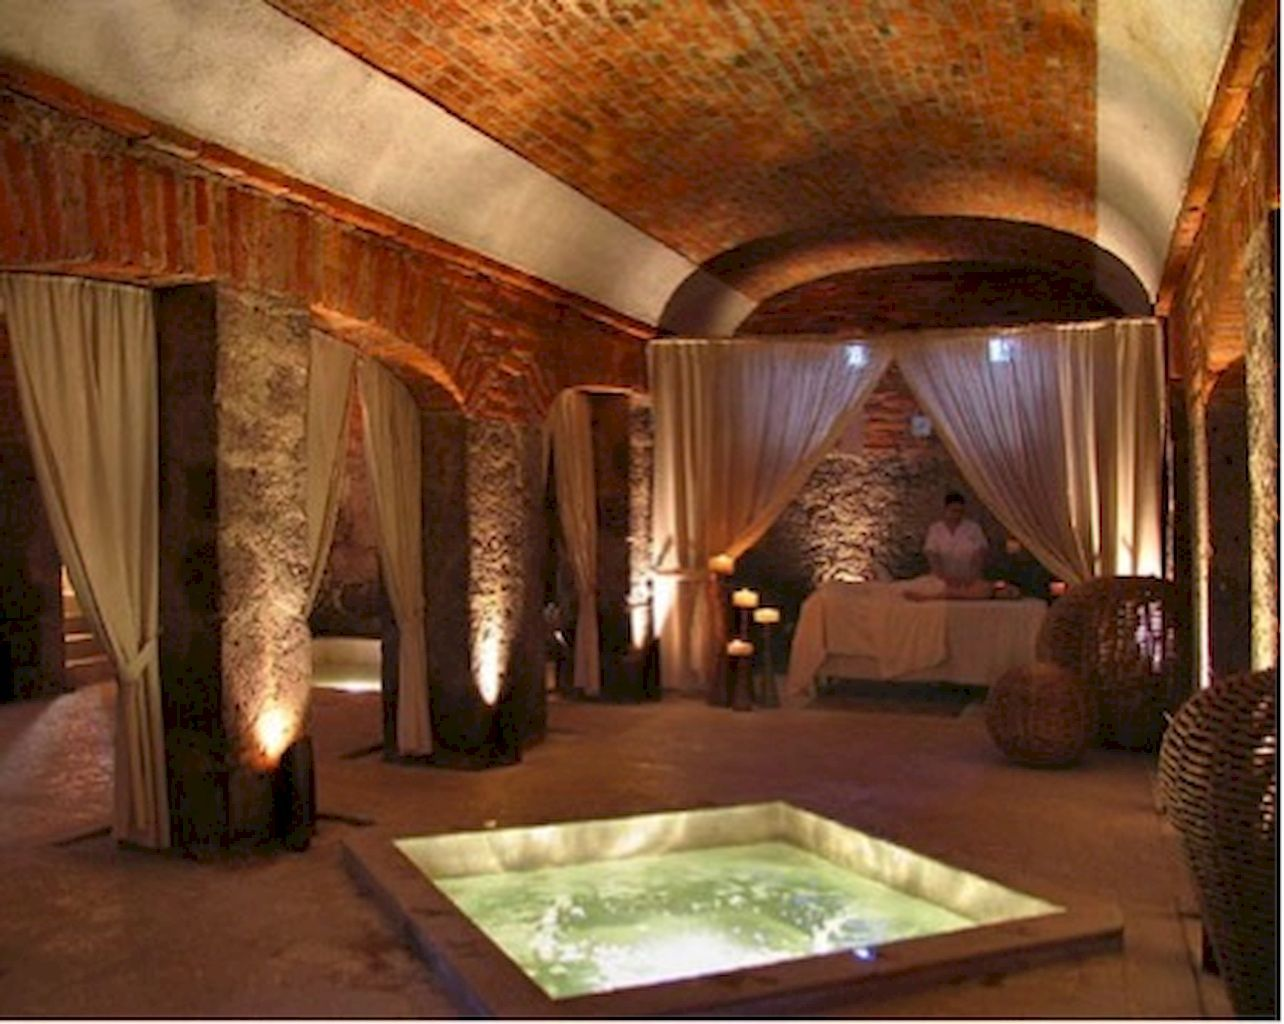 amazing italian style bedroom decor ideas  italian style  -  amazing italian style bedroom decor ideas